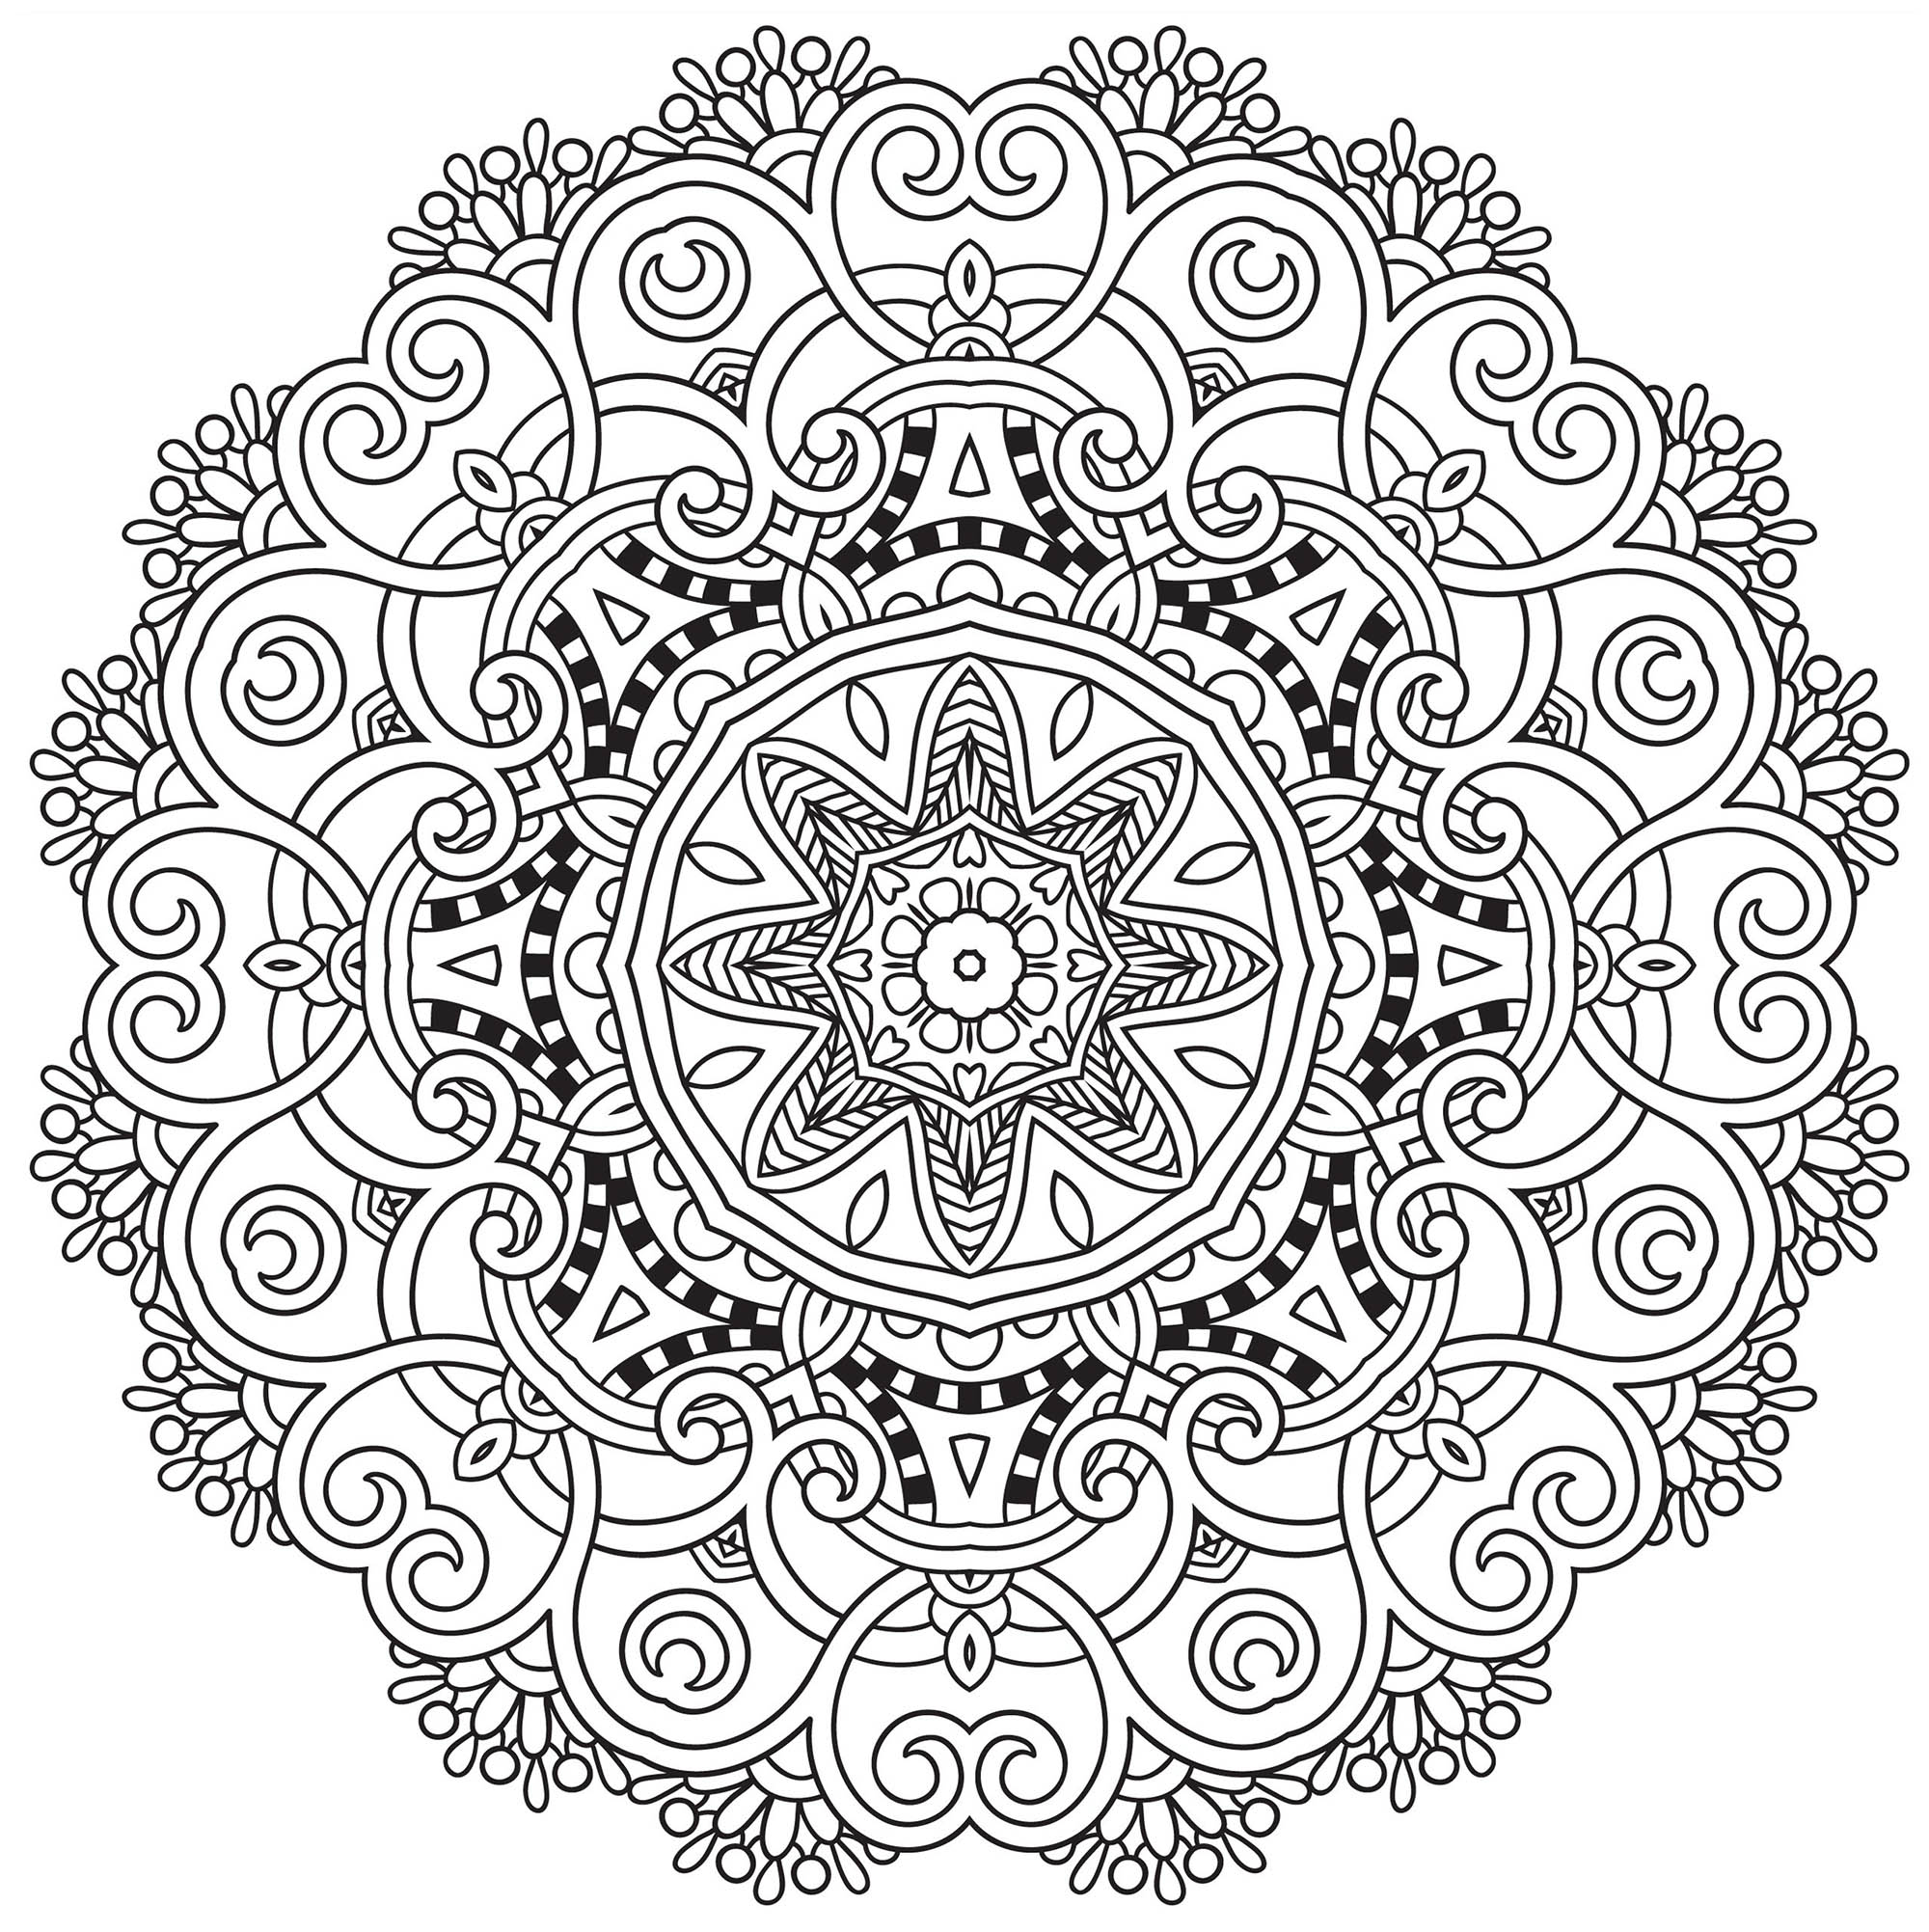 Colorear para adultos : Mandalas - 129